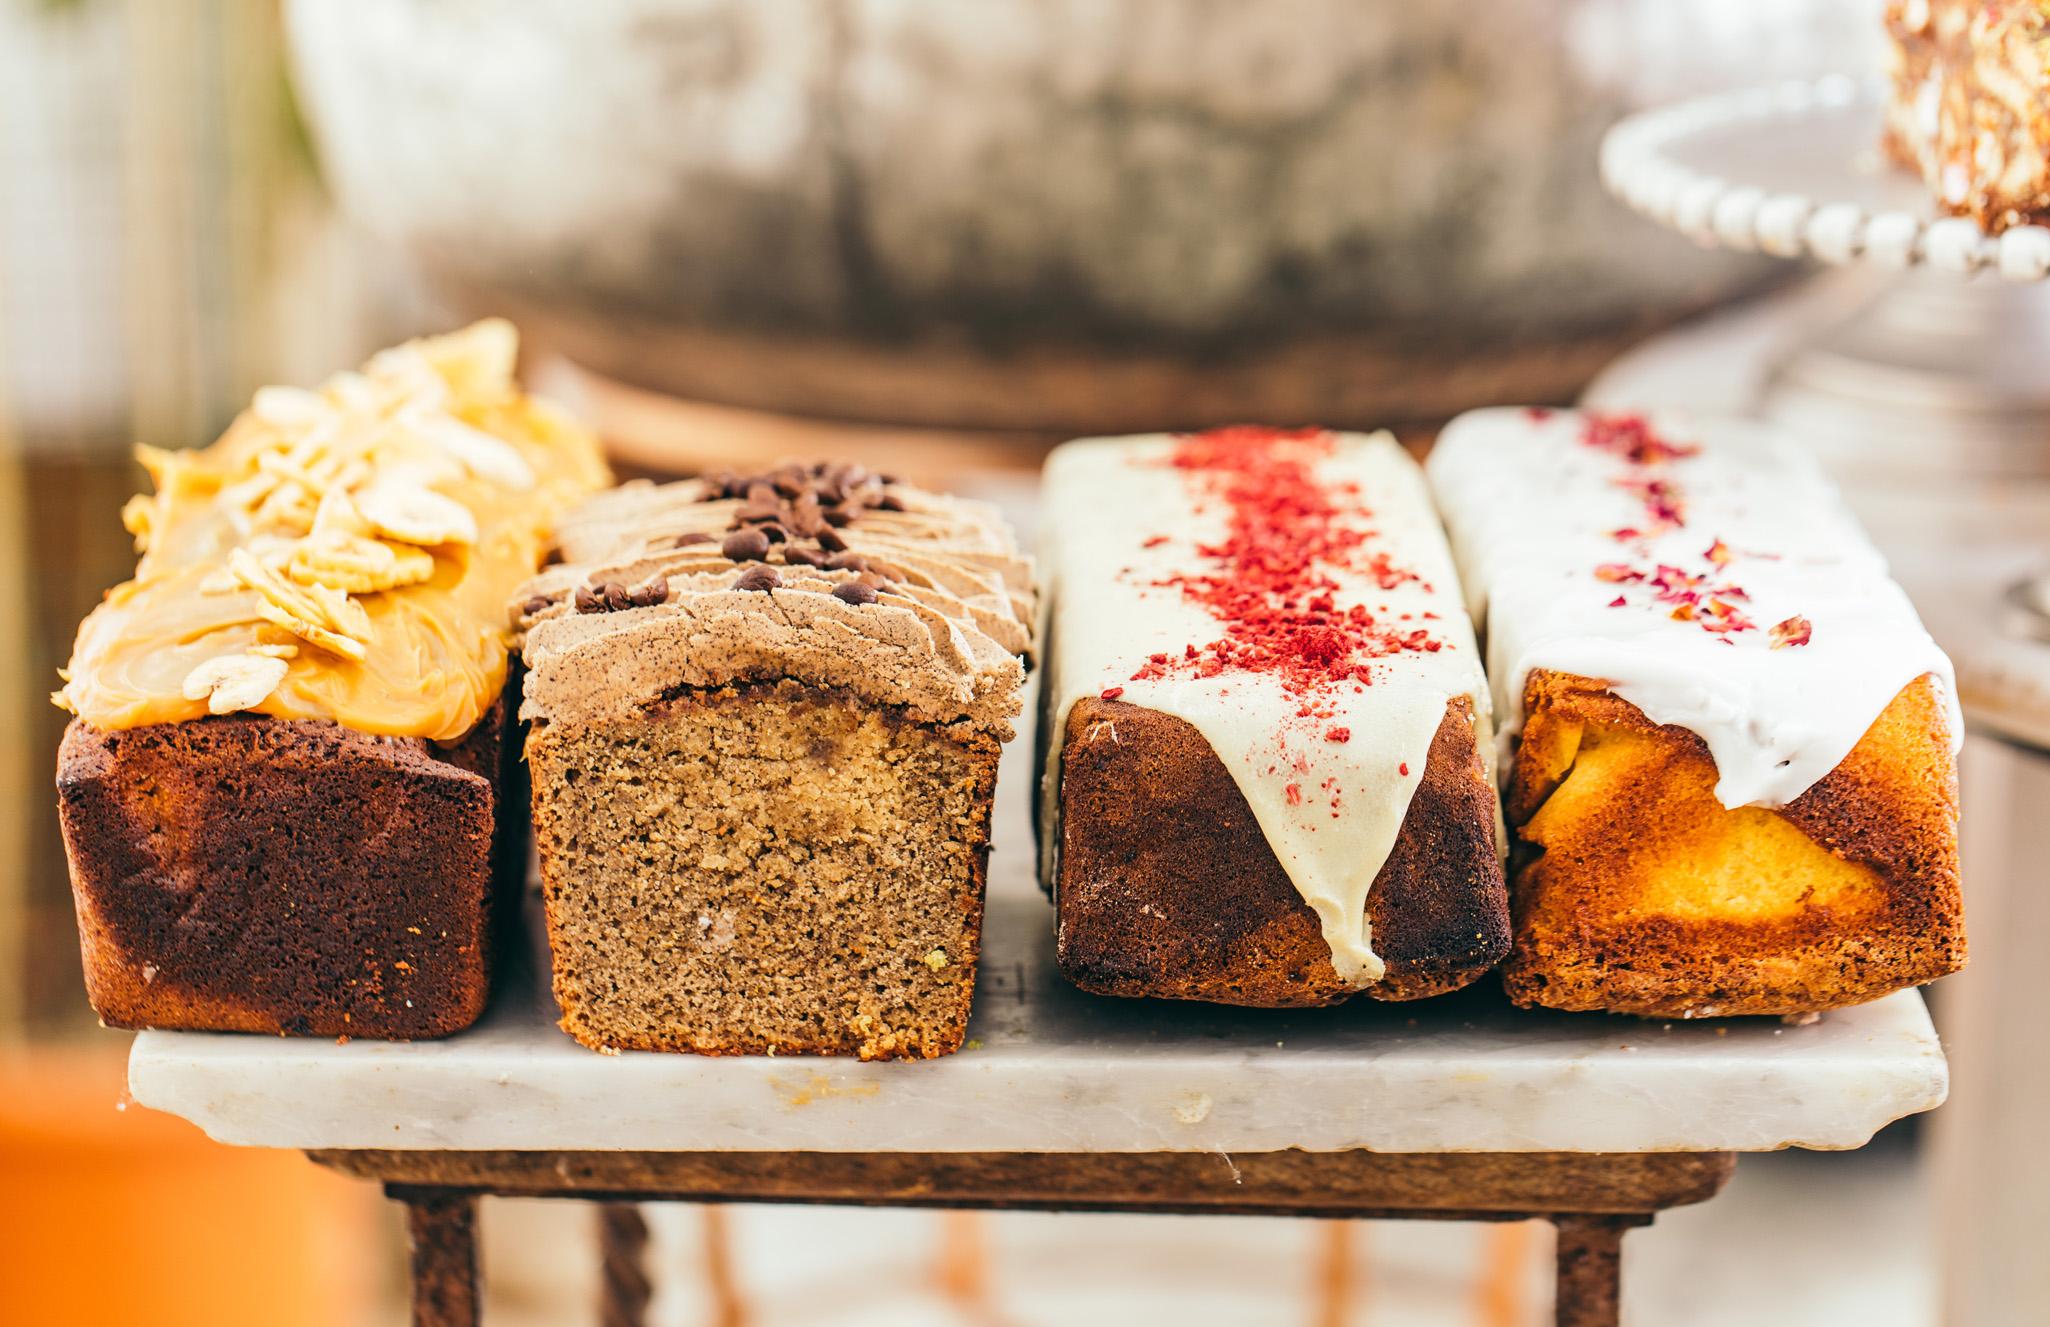 Medicine cakes